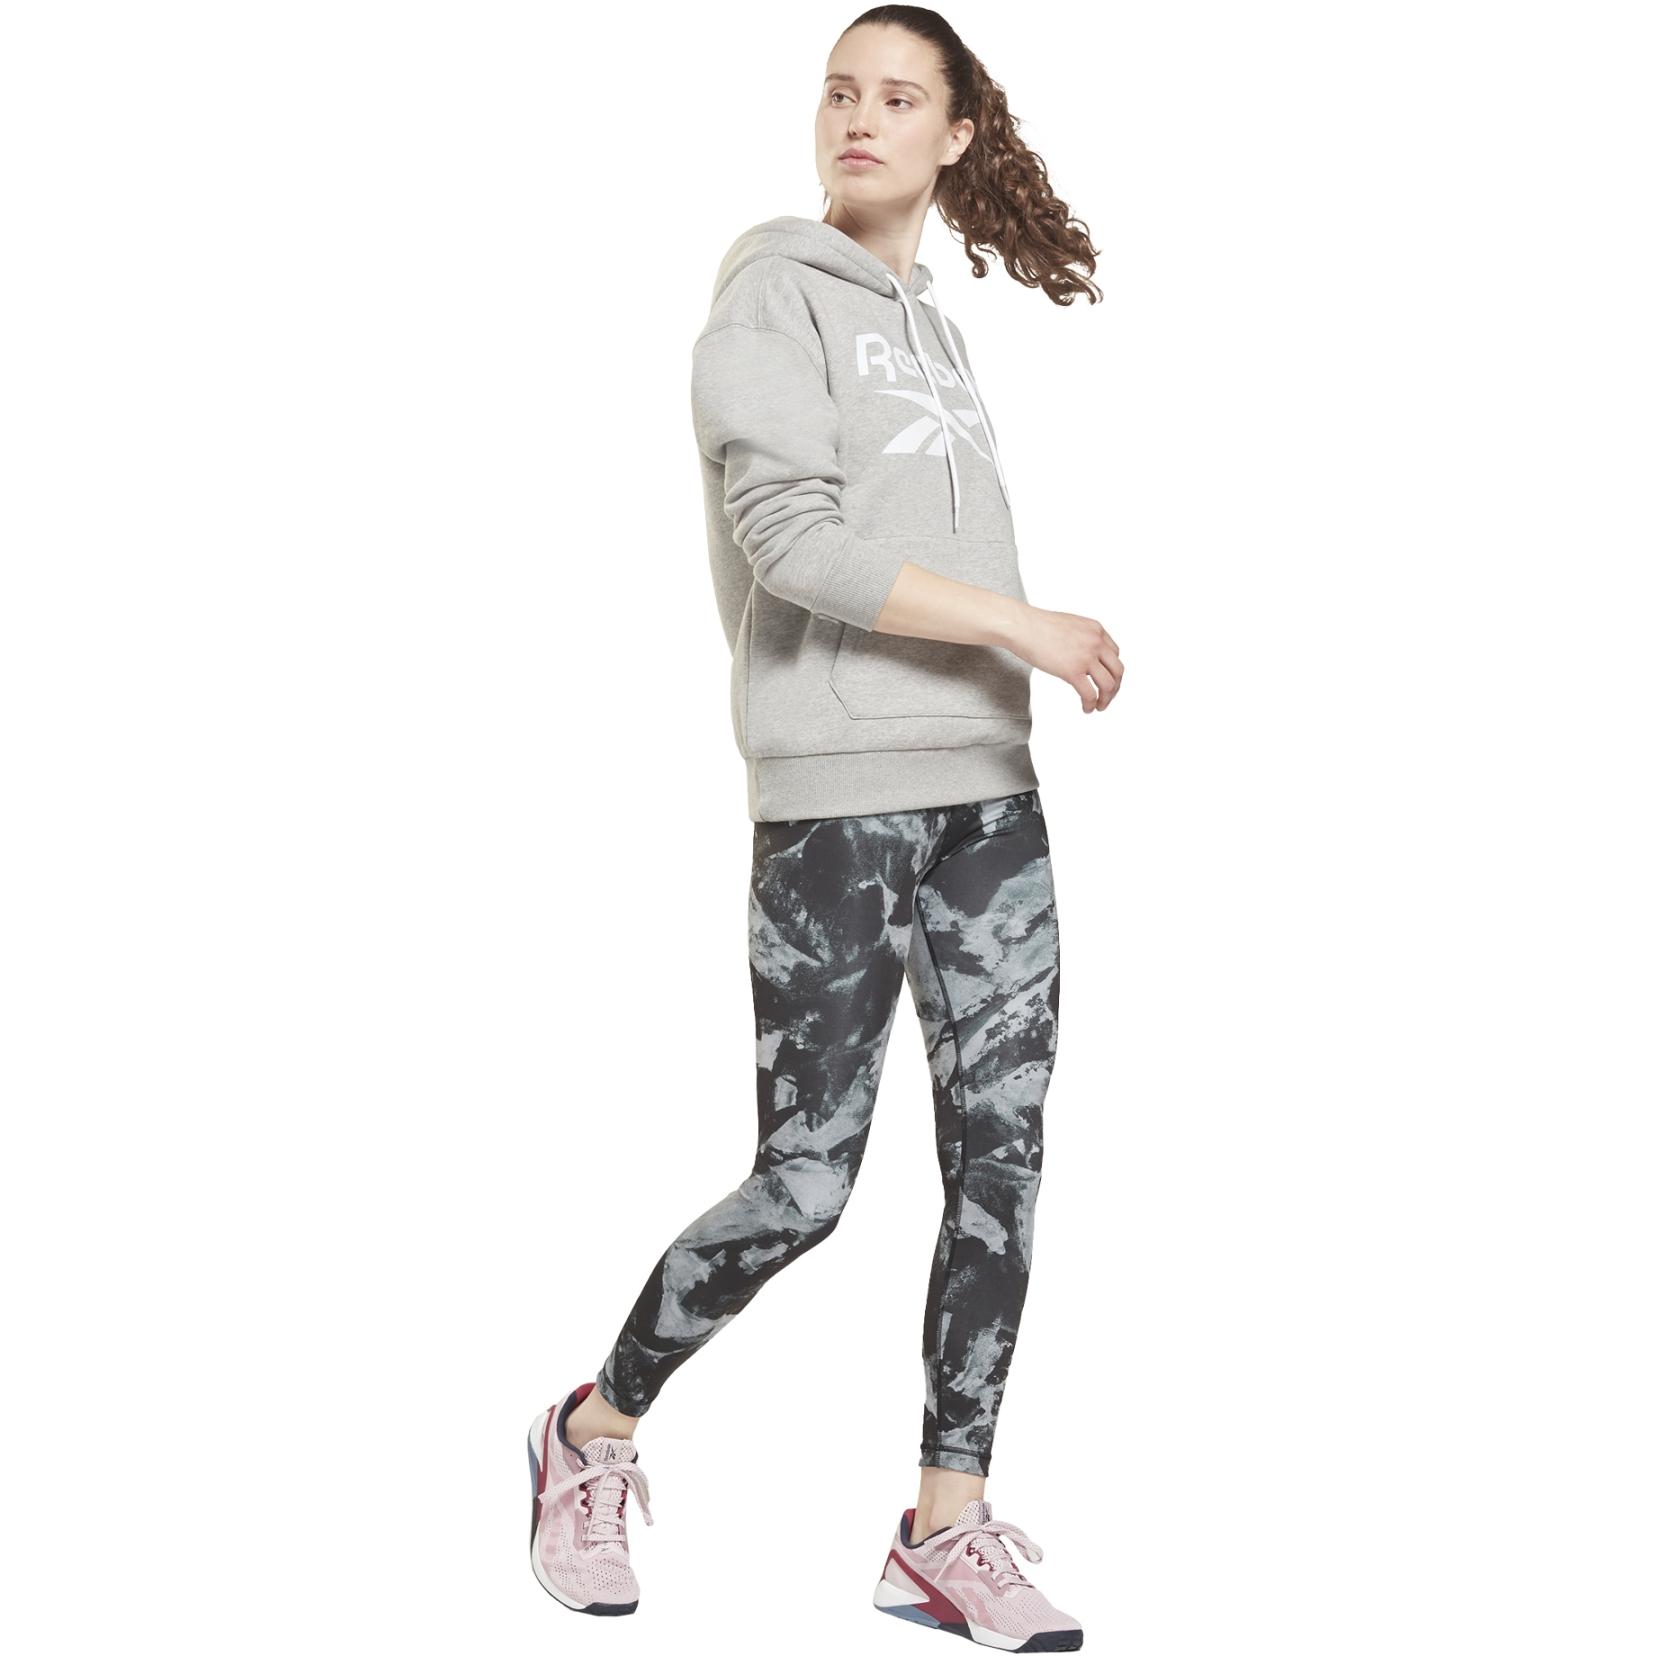 Image of Reebok MYT Printed Leggings Women's Tights - black